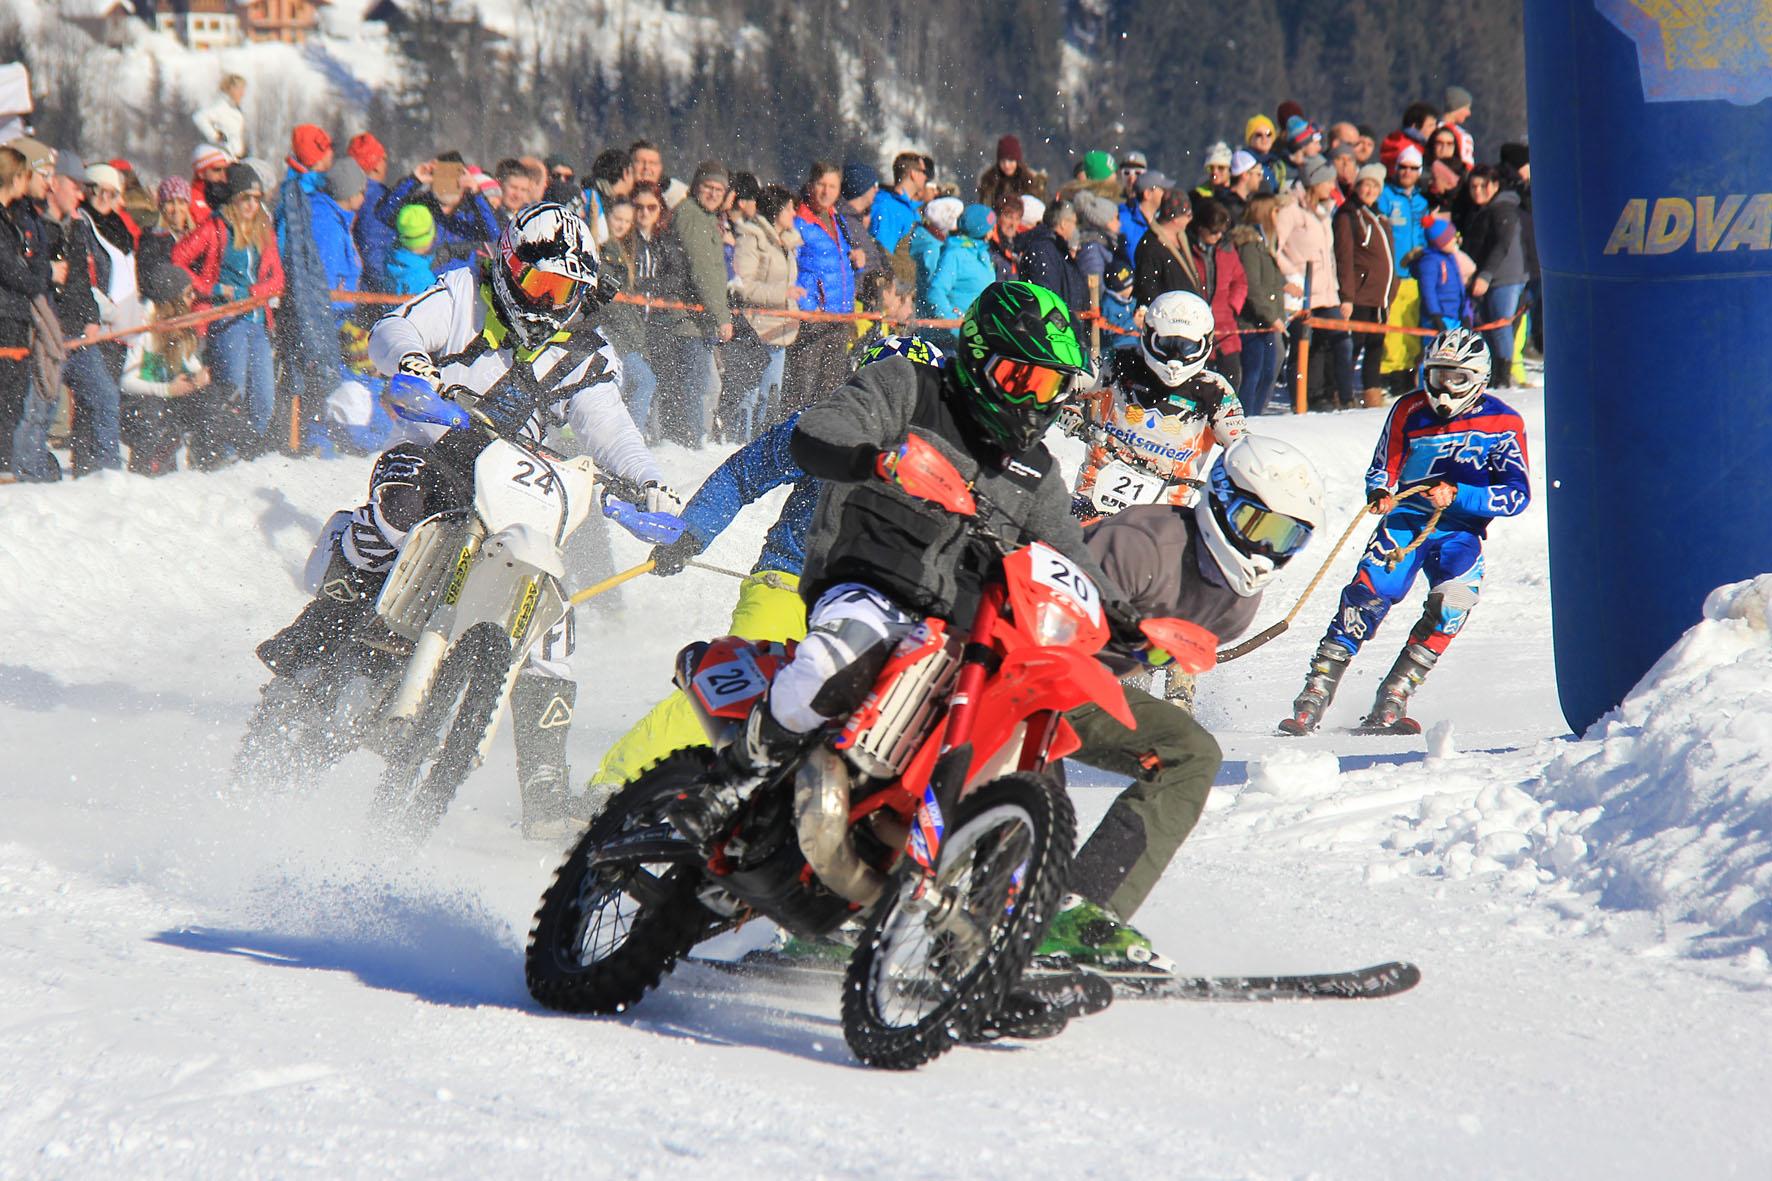 Holzknecht Skijöring Gosau _ Impression 1 _ Bild Karl Posch _ LR